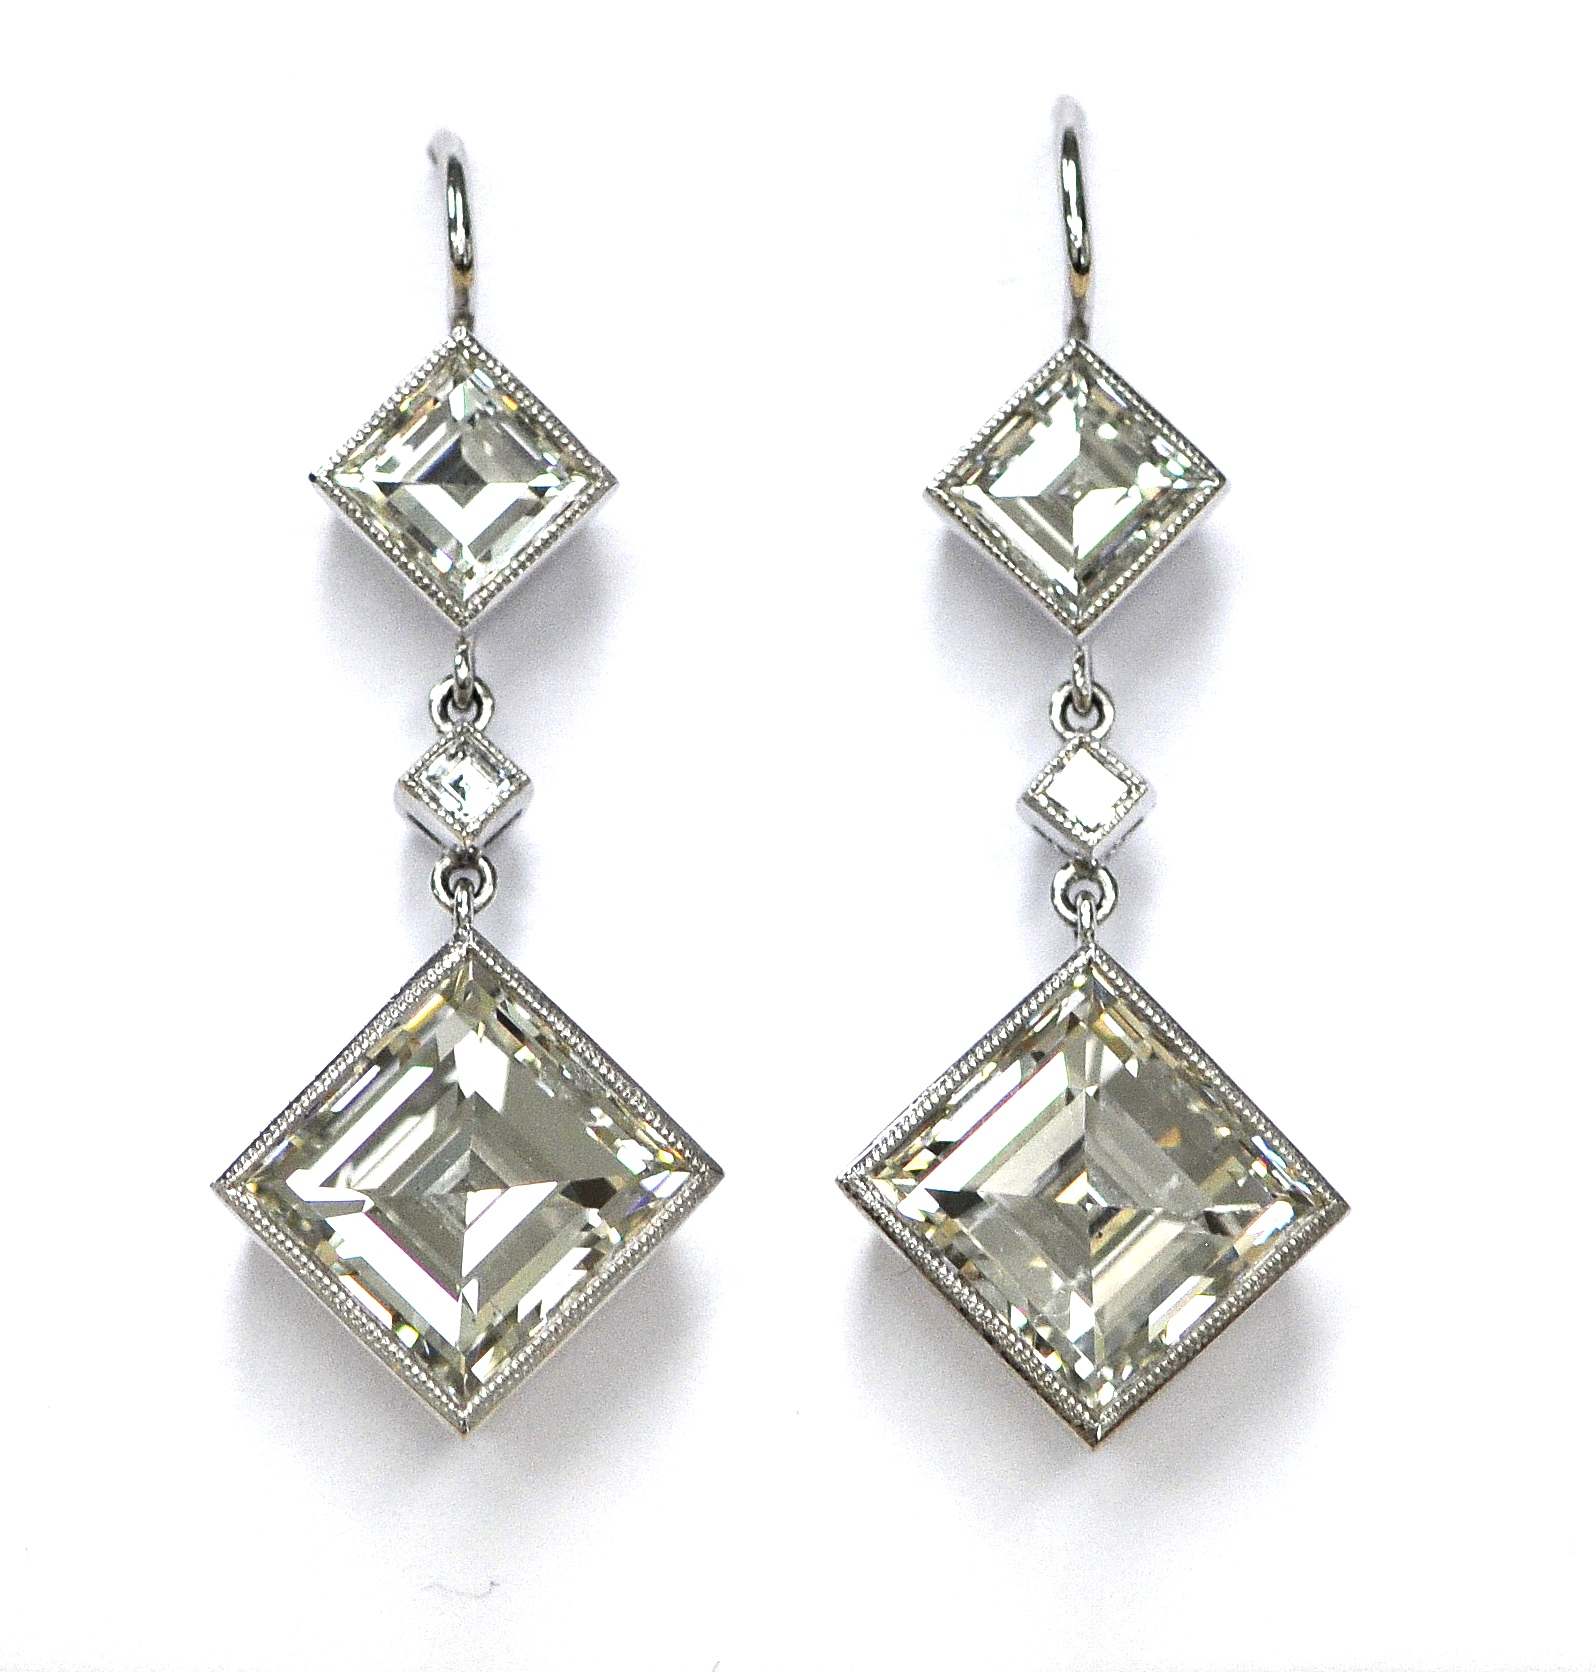 10ct Square Cut Diamond Earrings